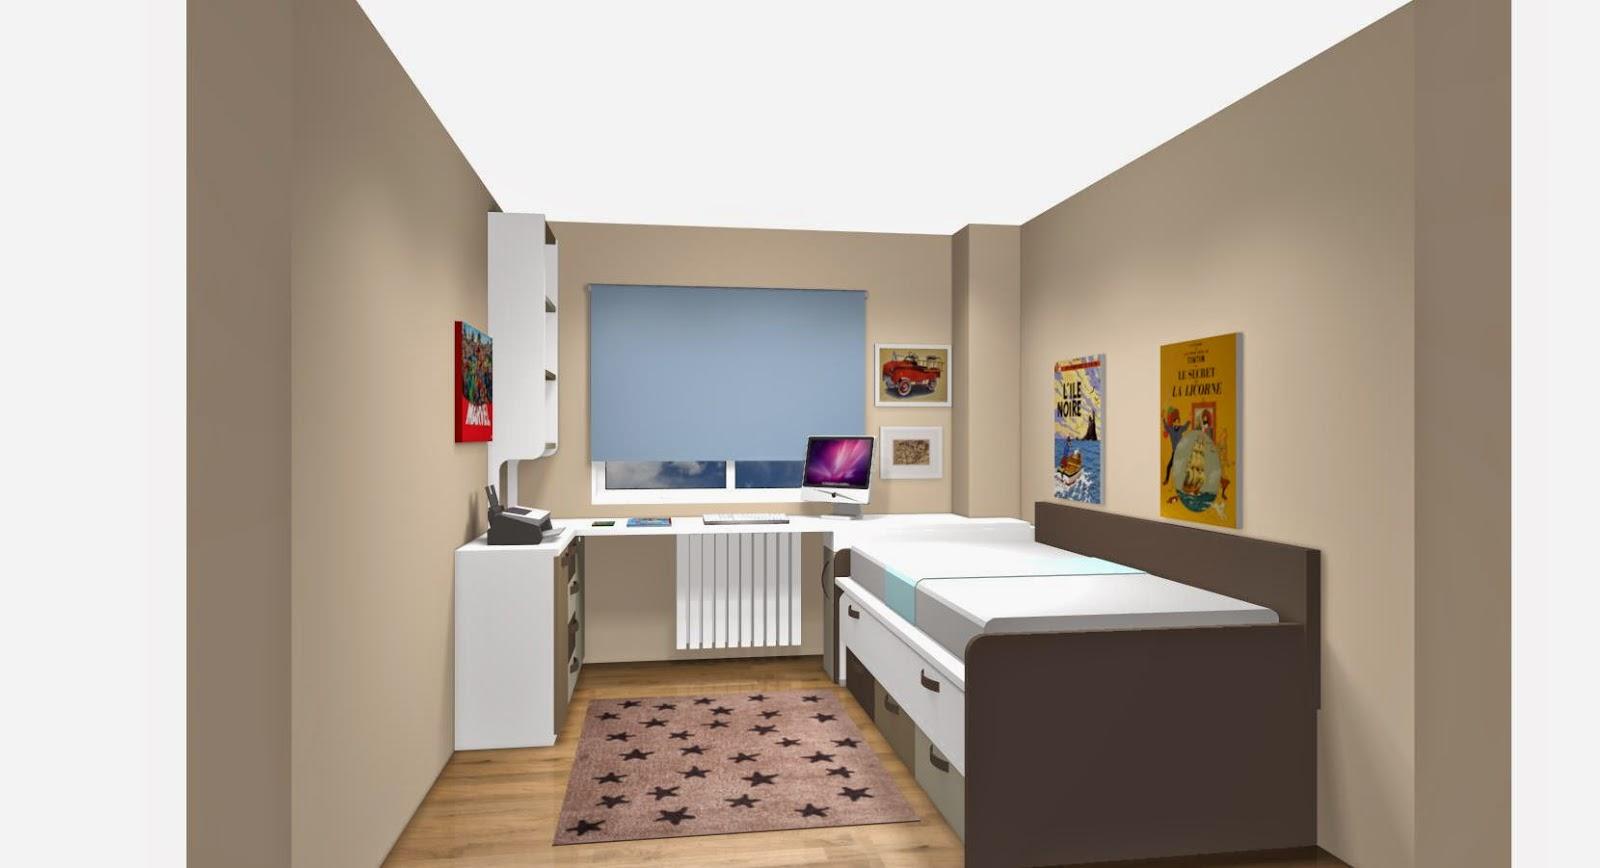 Amueblar habitacion en xikara - Dormitorio juvenil nino ...